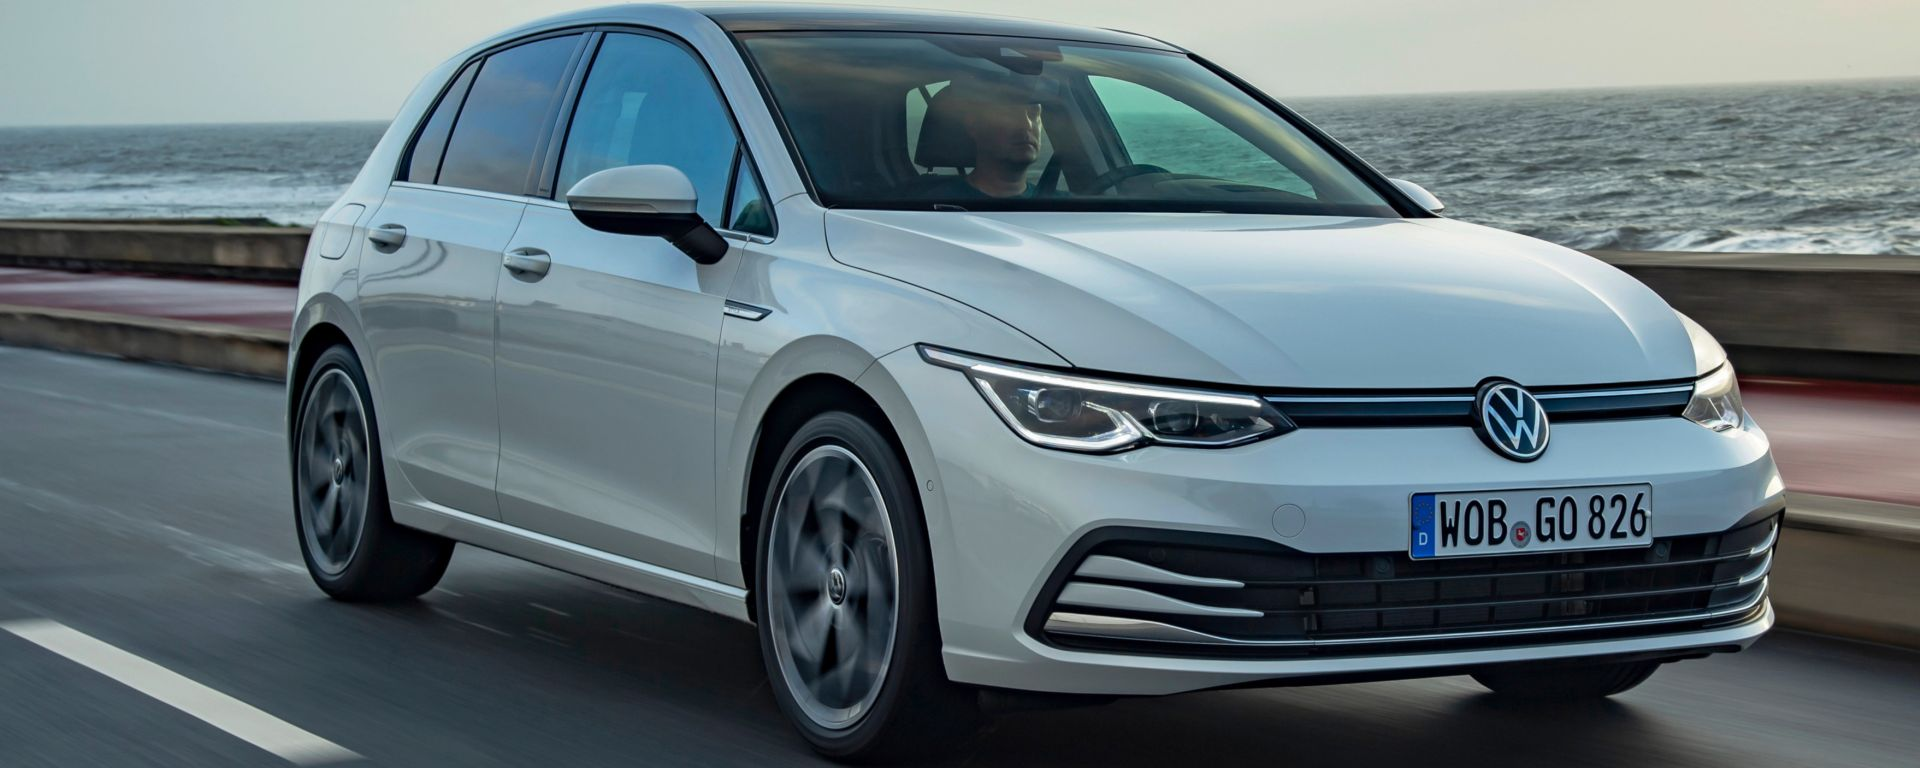 Nuova Volkswagen Golf TGI